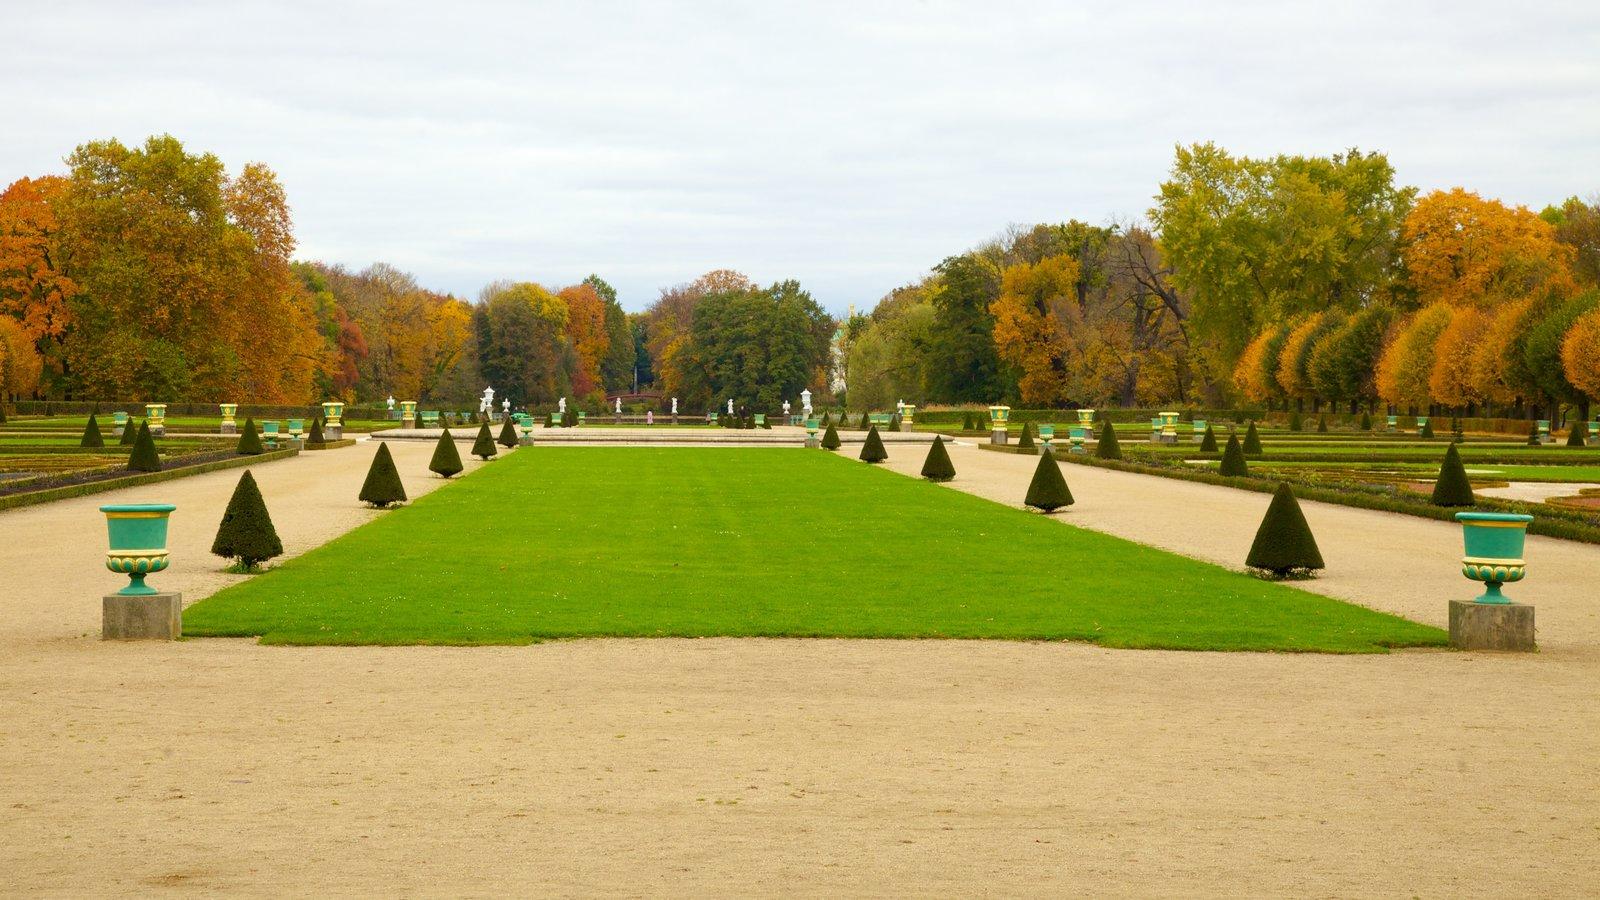 Schloss Charlottenburg showing a garden and autumn leaves